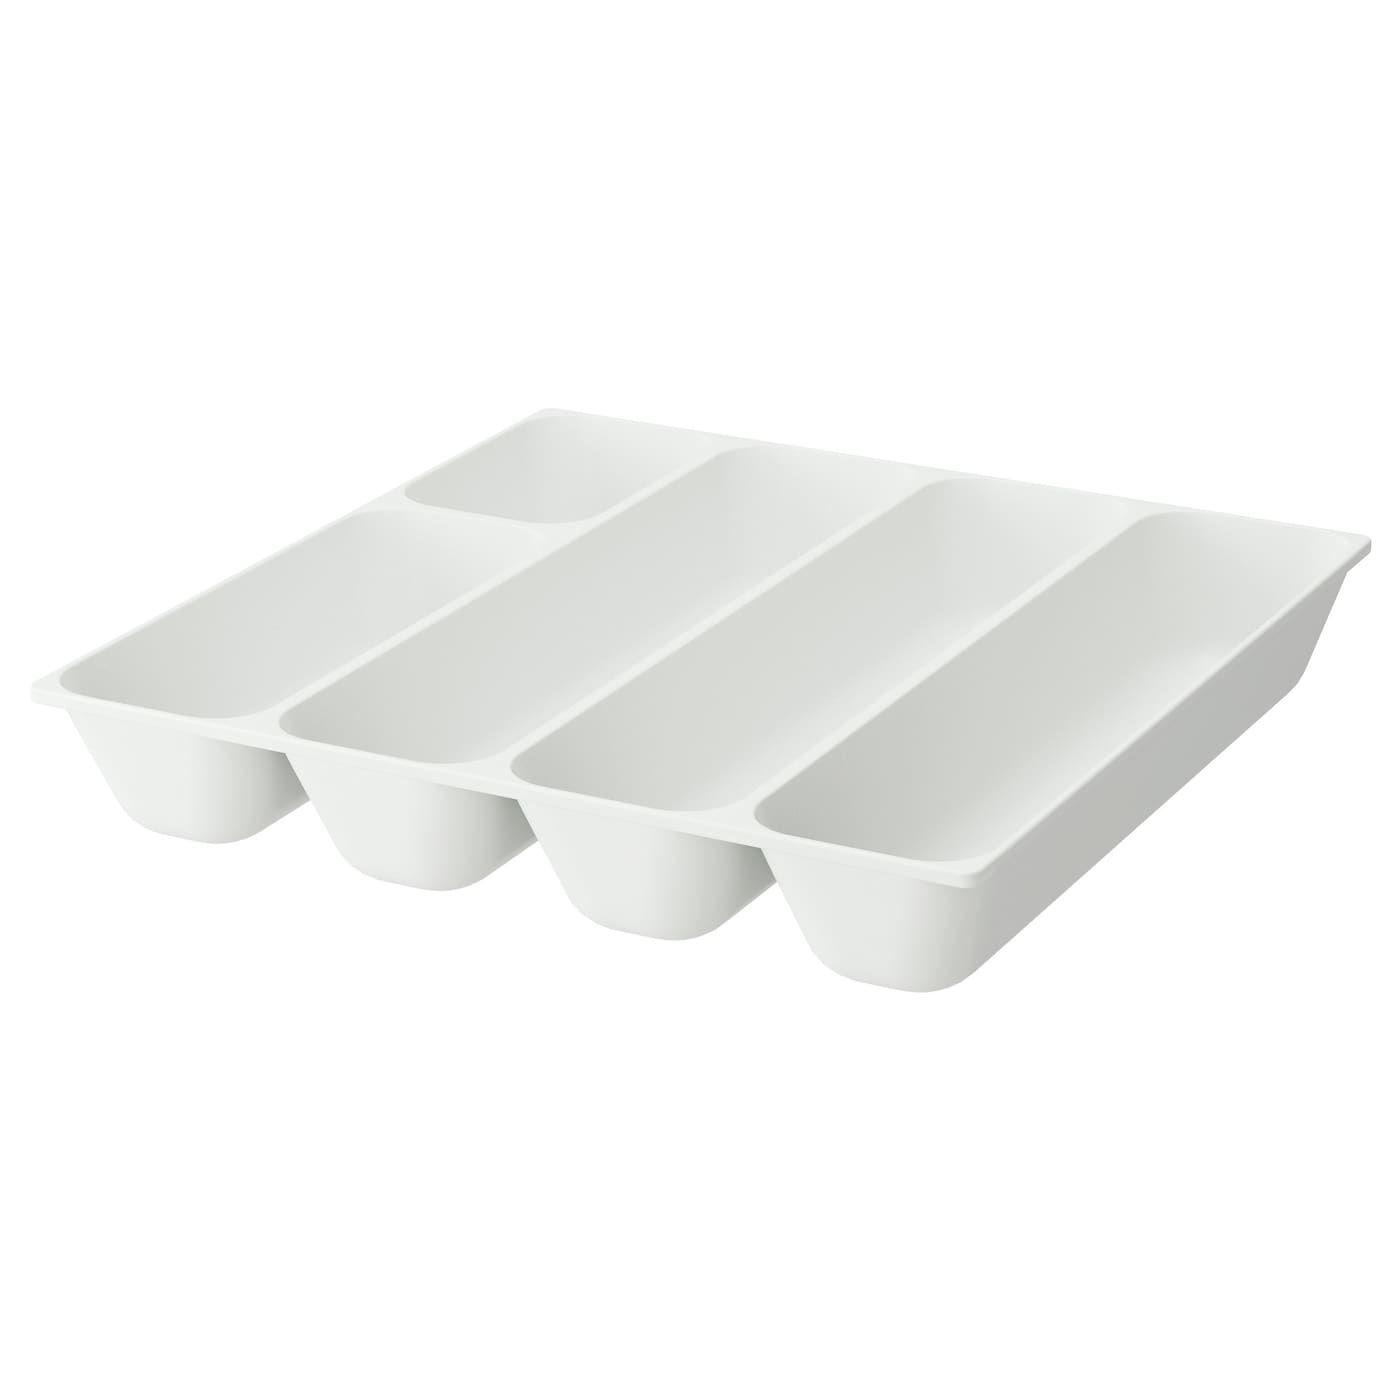 IKEA VARIERA Besteckkasten - weiß